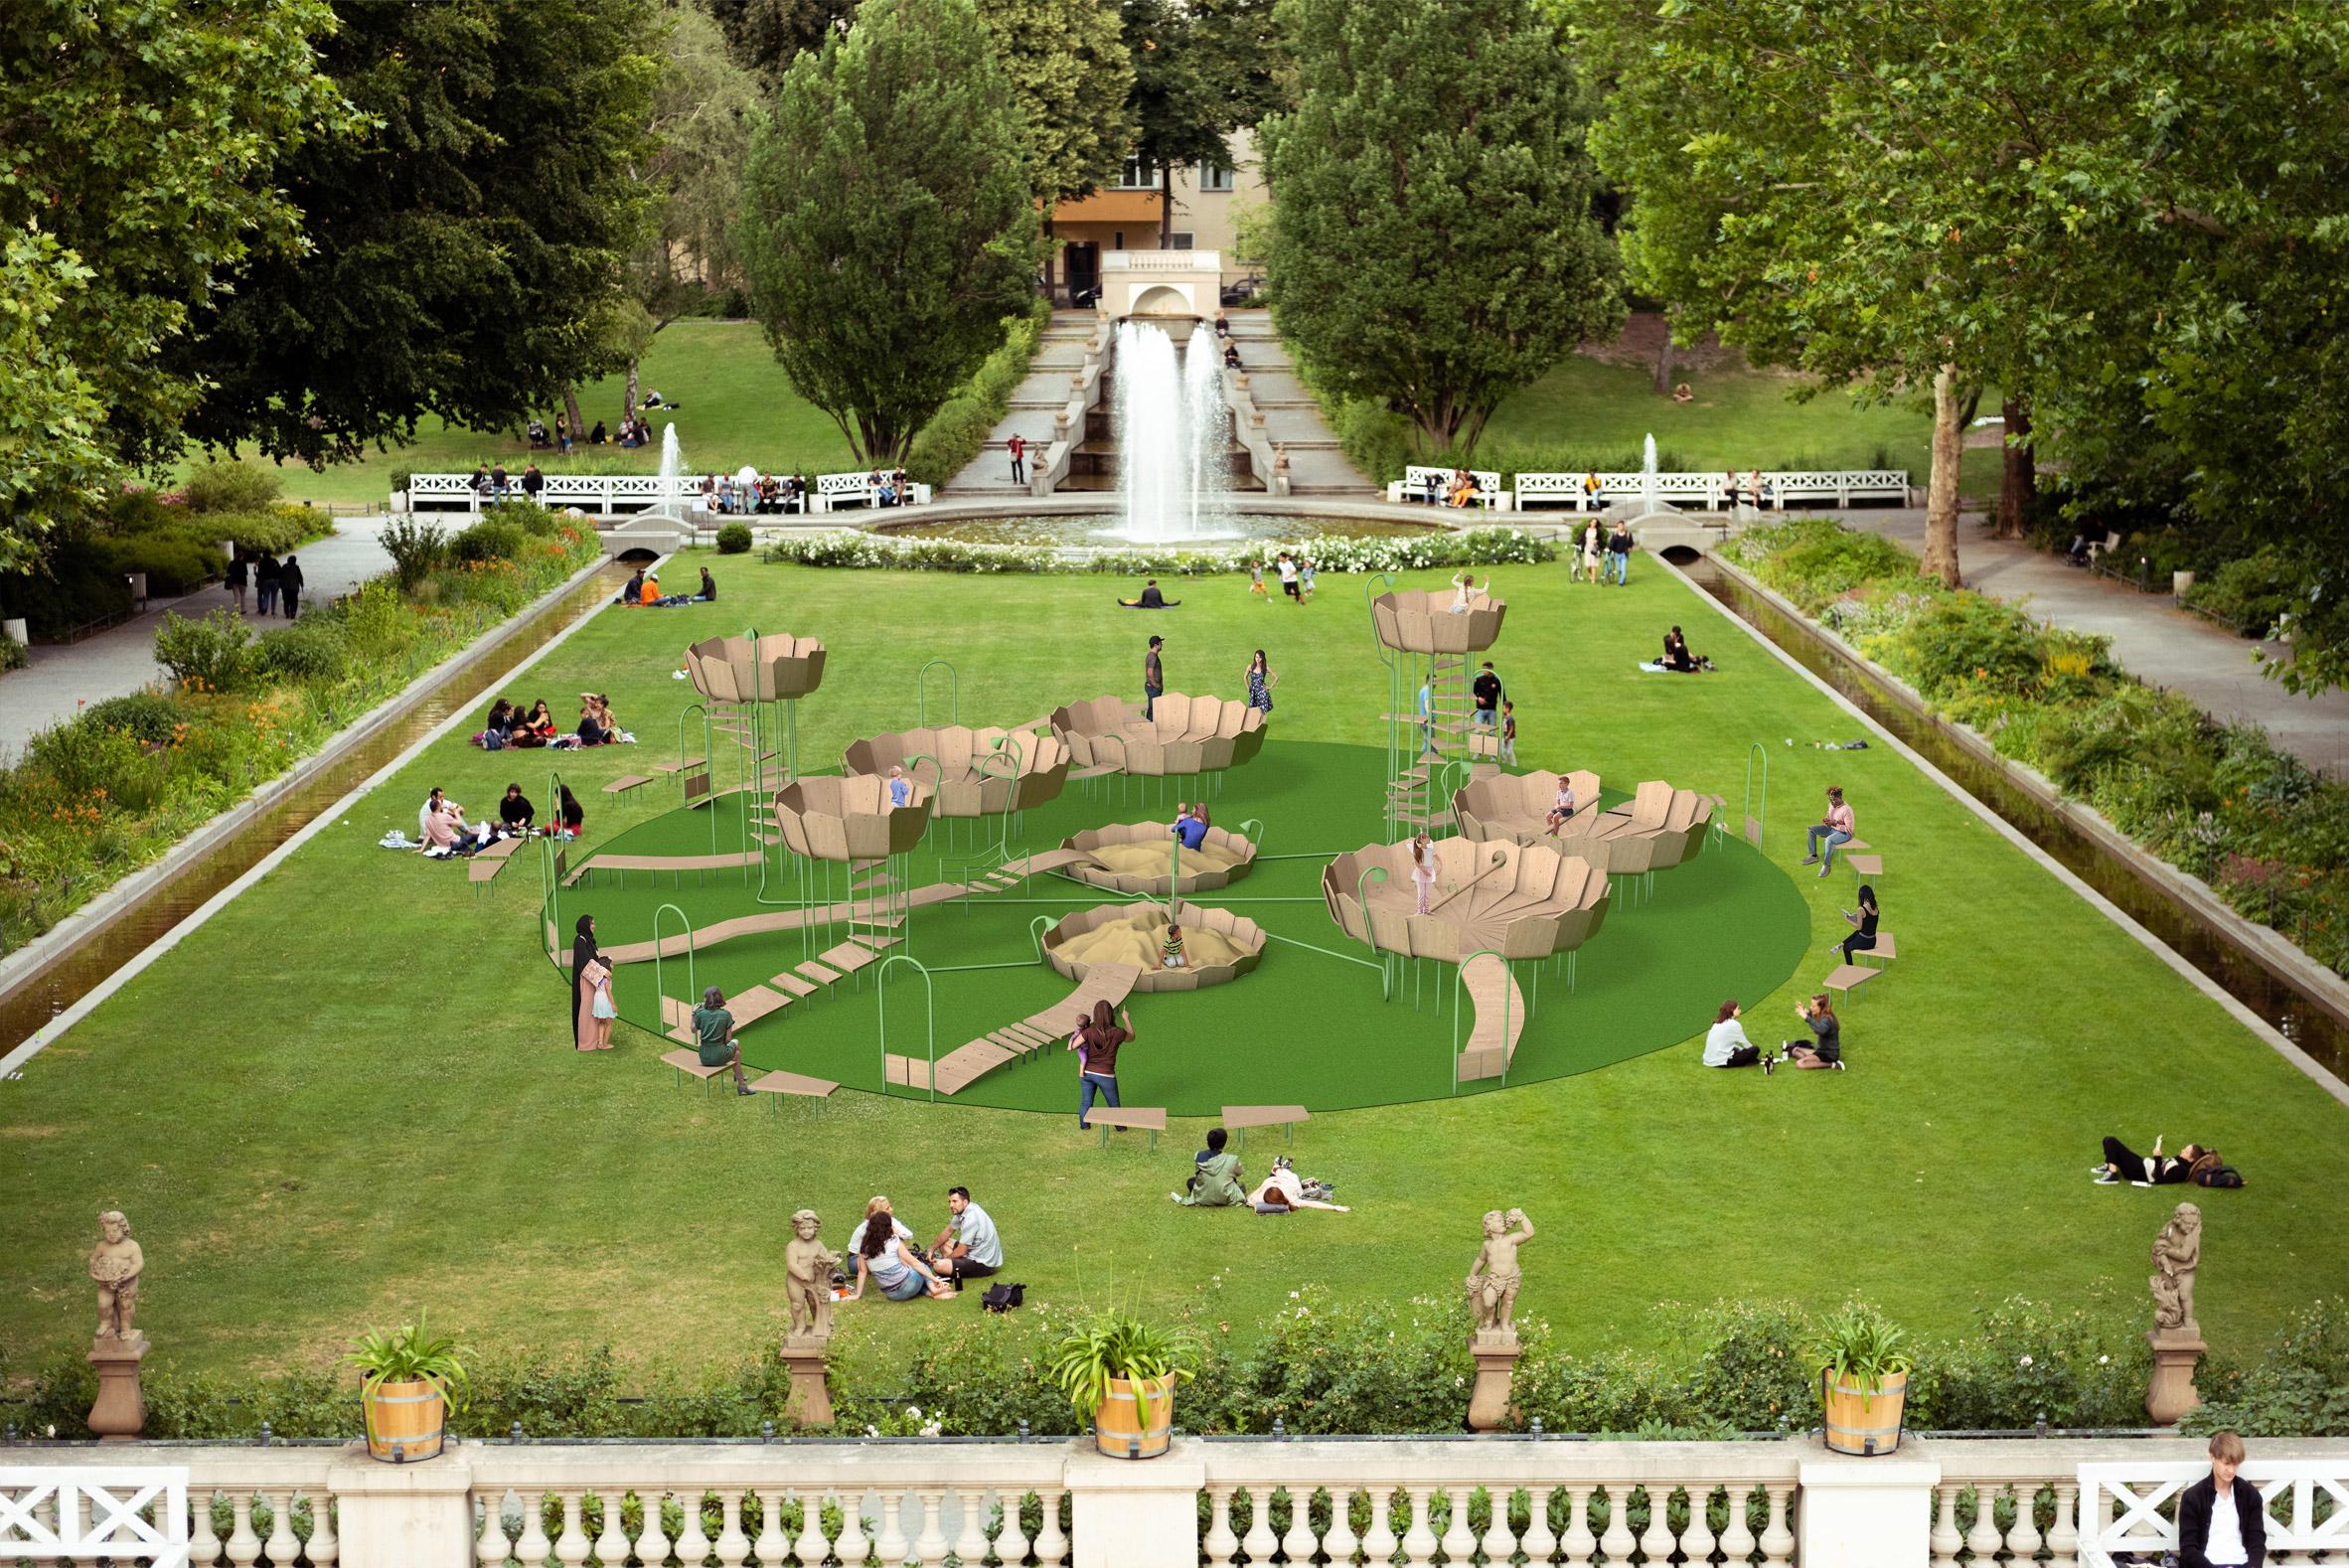 play-rimbin-playground-concept-design_dezeen_2364_col_8.jpg